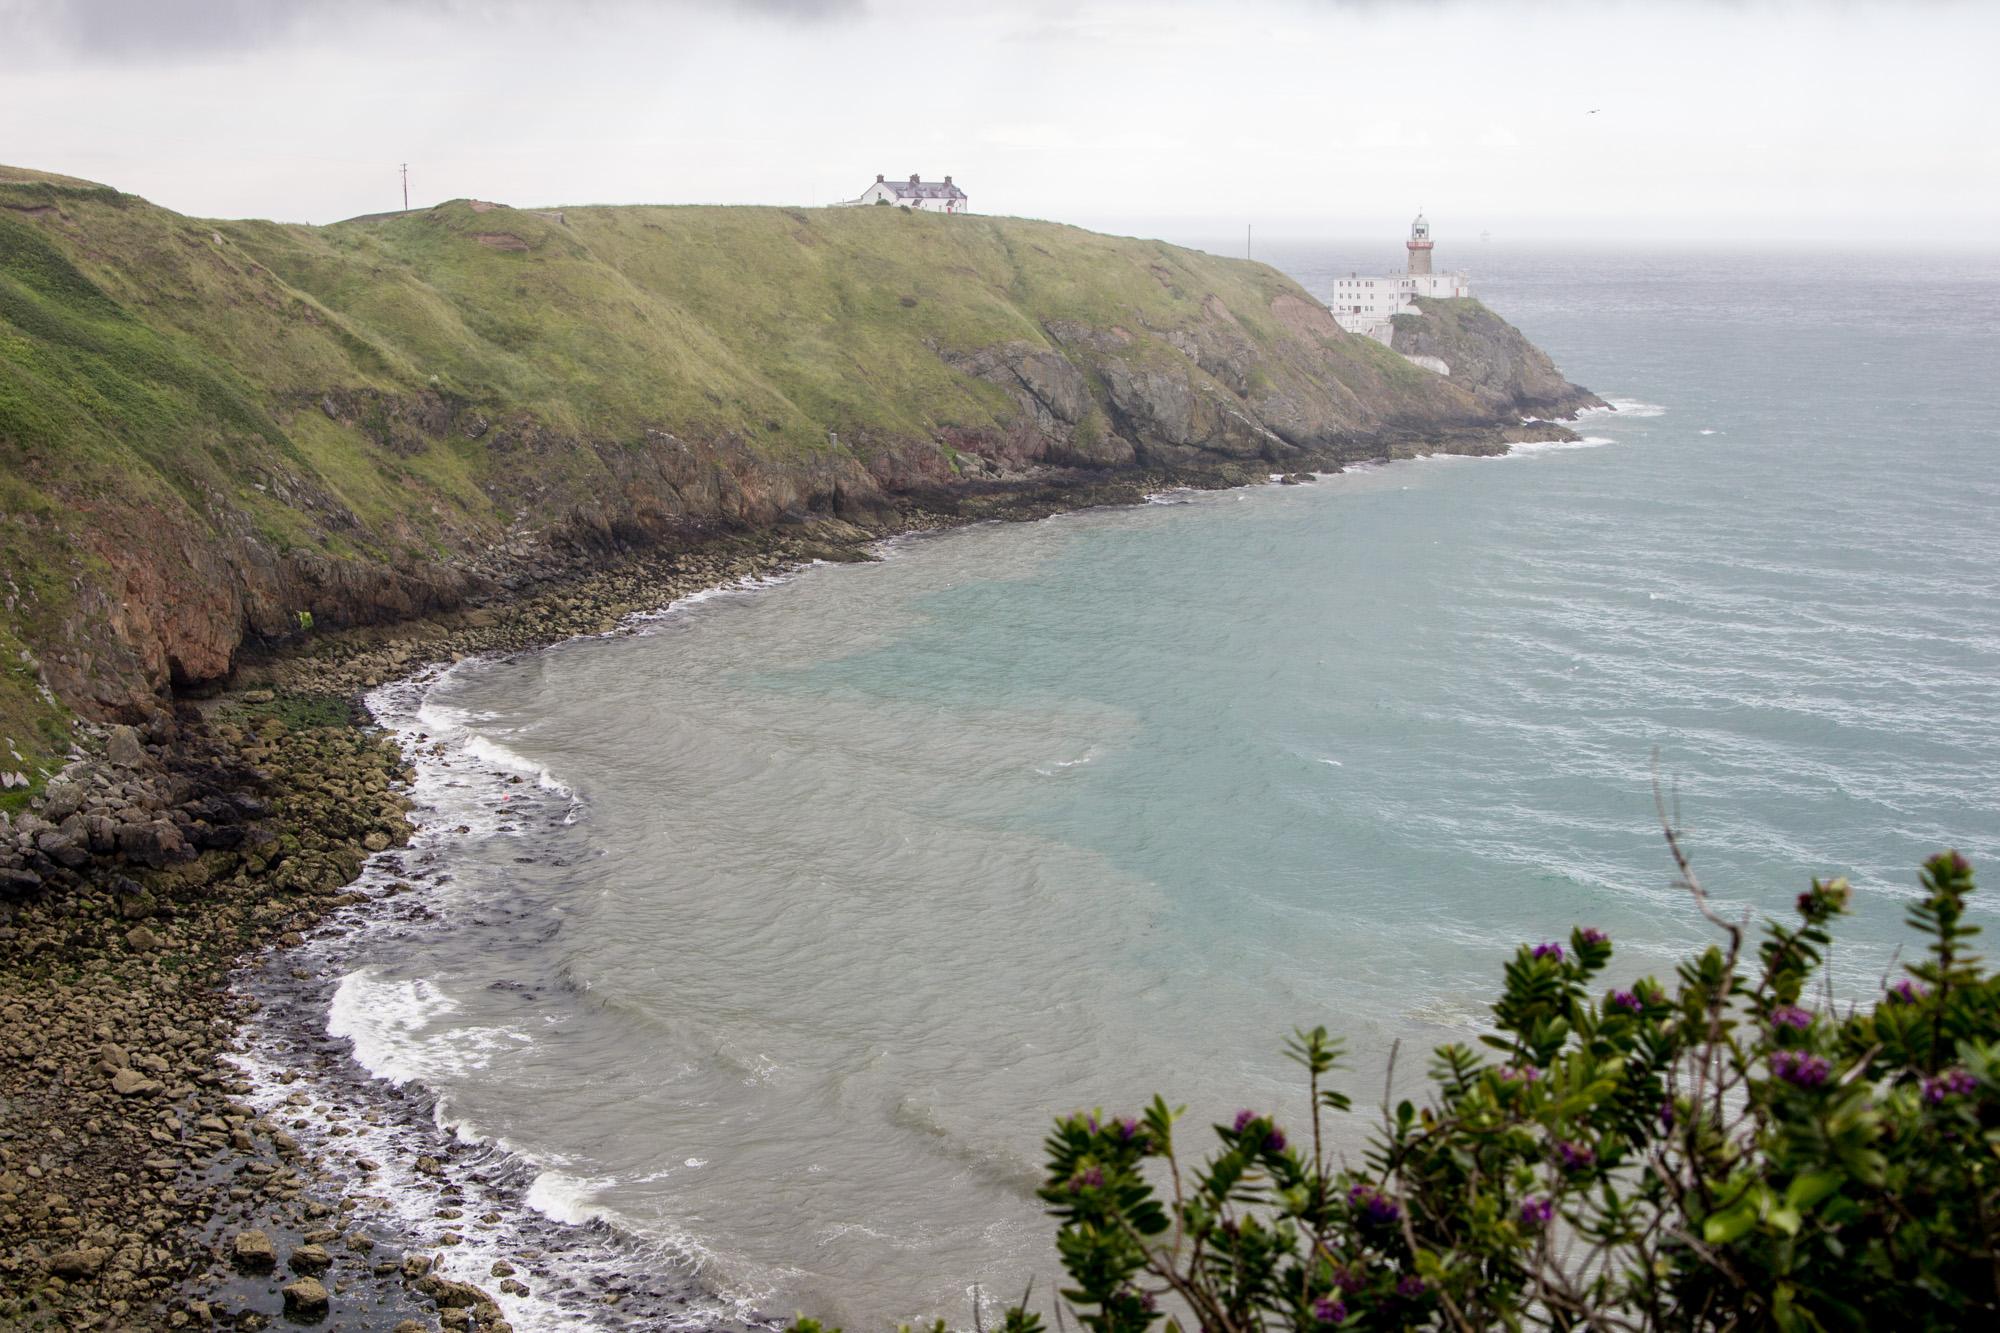 Howth Cliff Walk near Dublin, Ireland has a view of a lighthouse